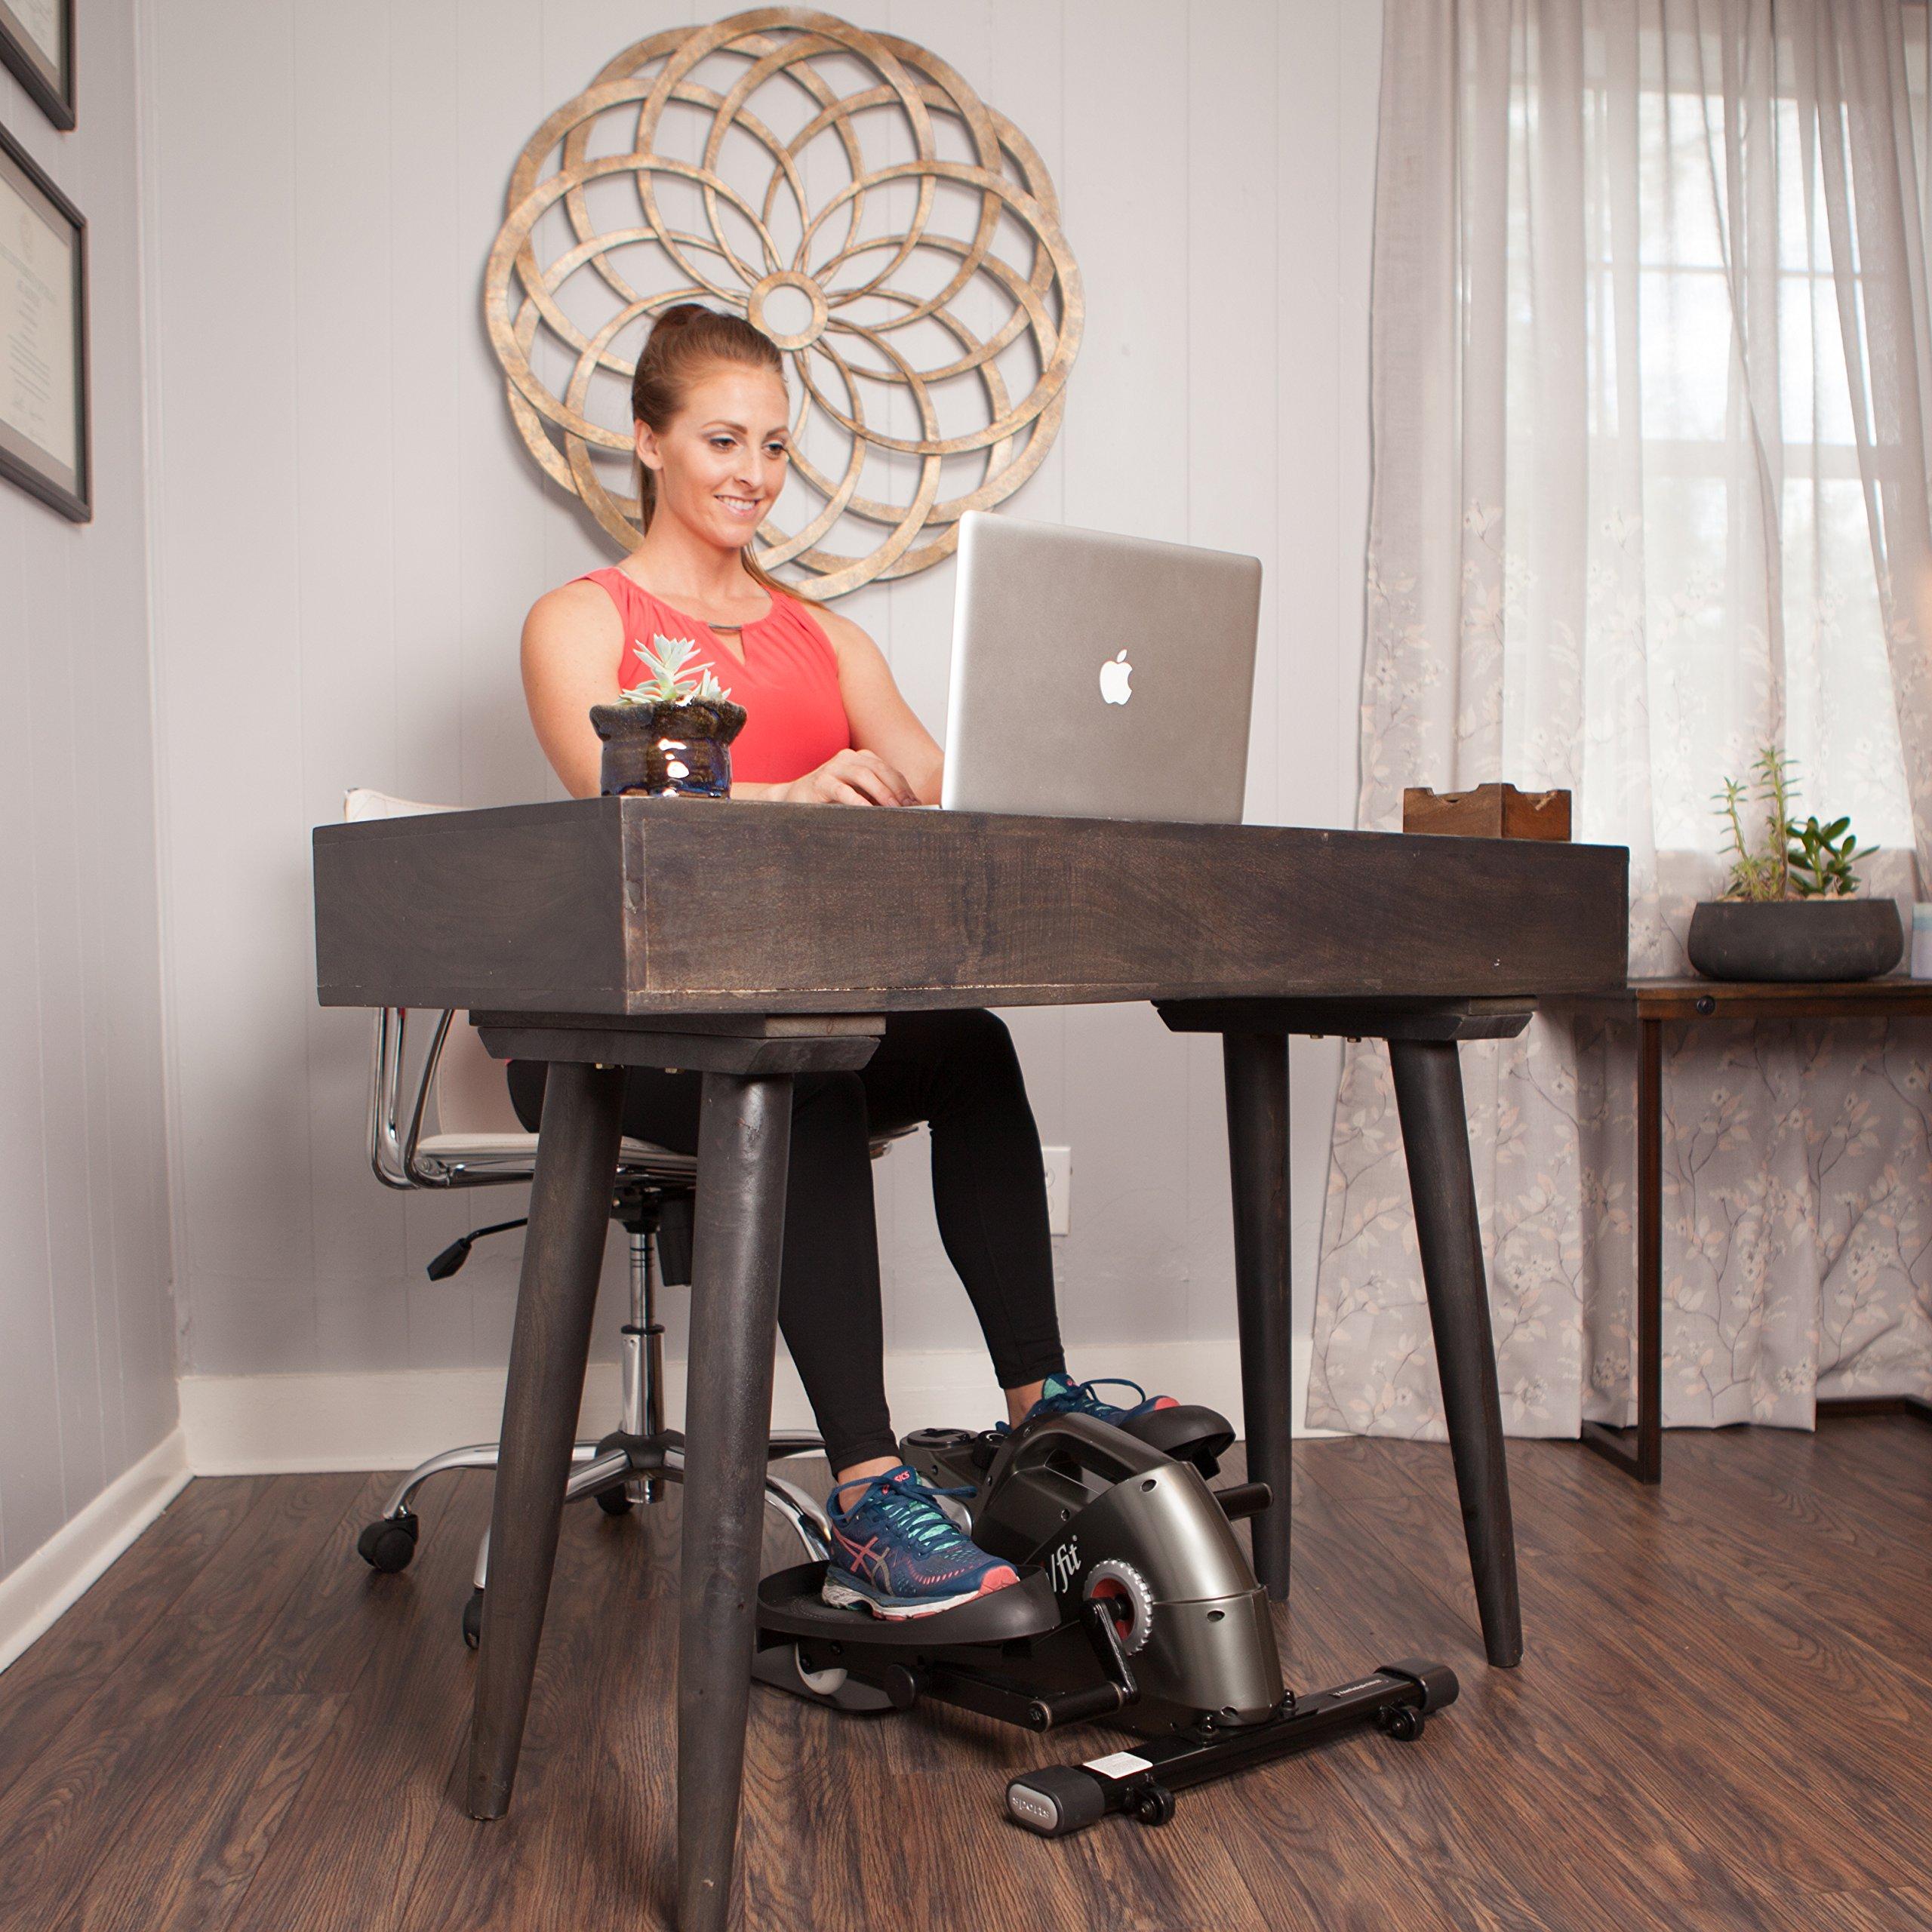 JFIT 50-1000-PEWj/Fit Under Desk & Stand Up Mini Elliptical, Pewter by JFIT (Image #6)